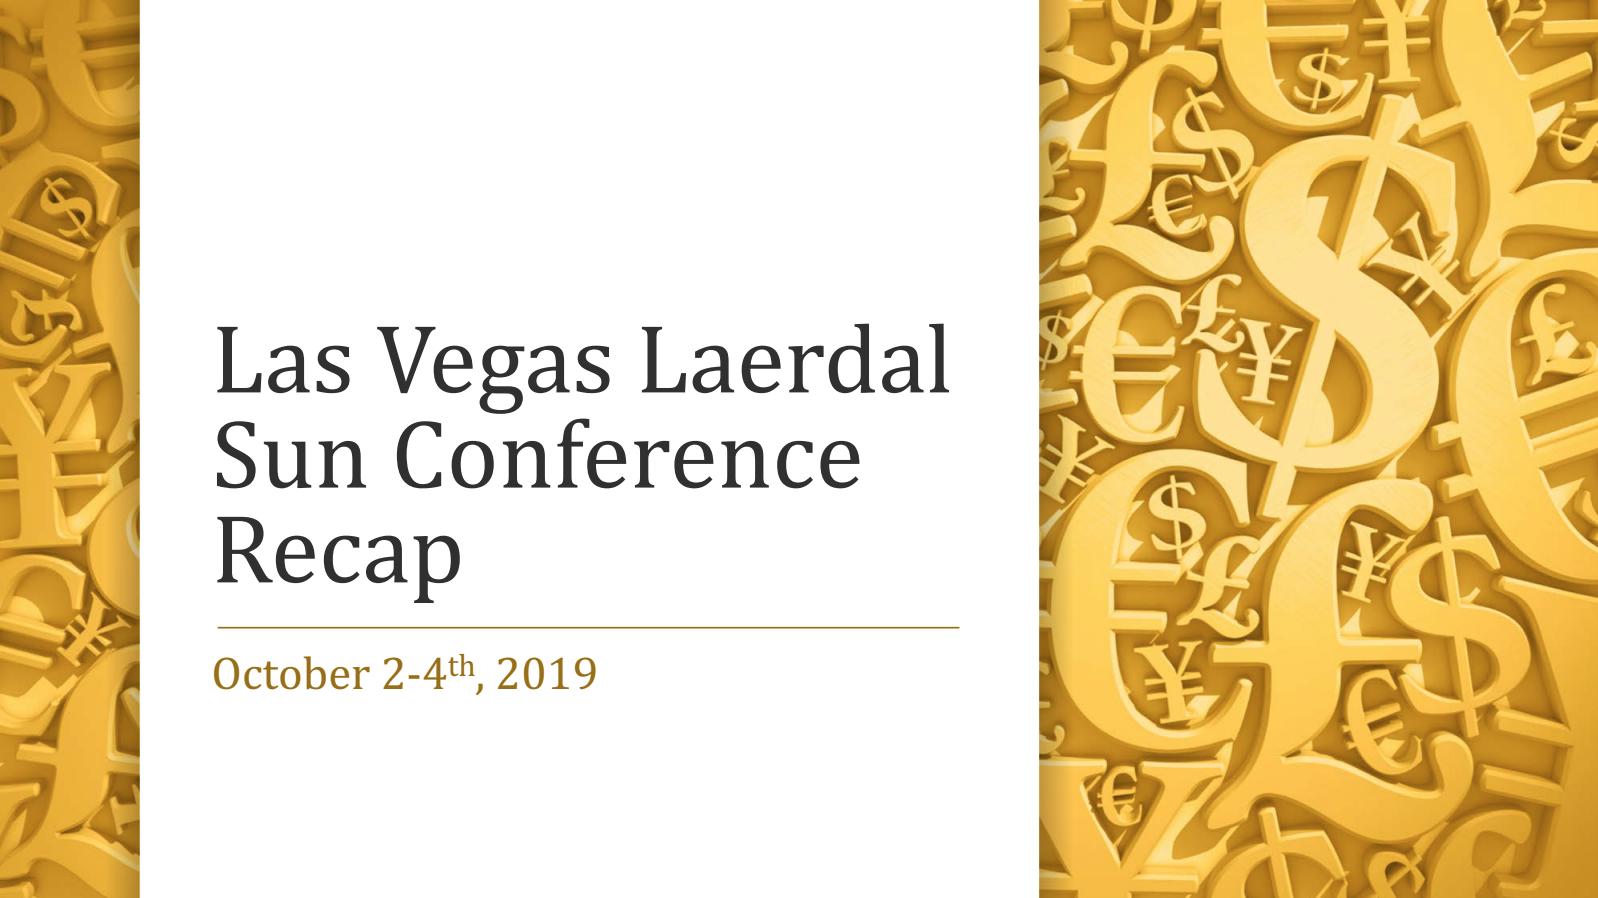 Las Vegas Laerdal SUN Conference 2019